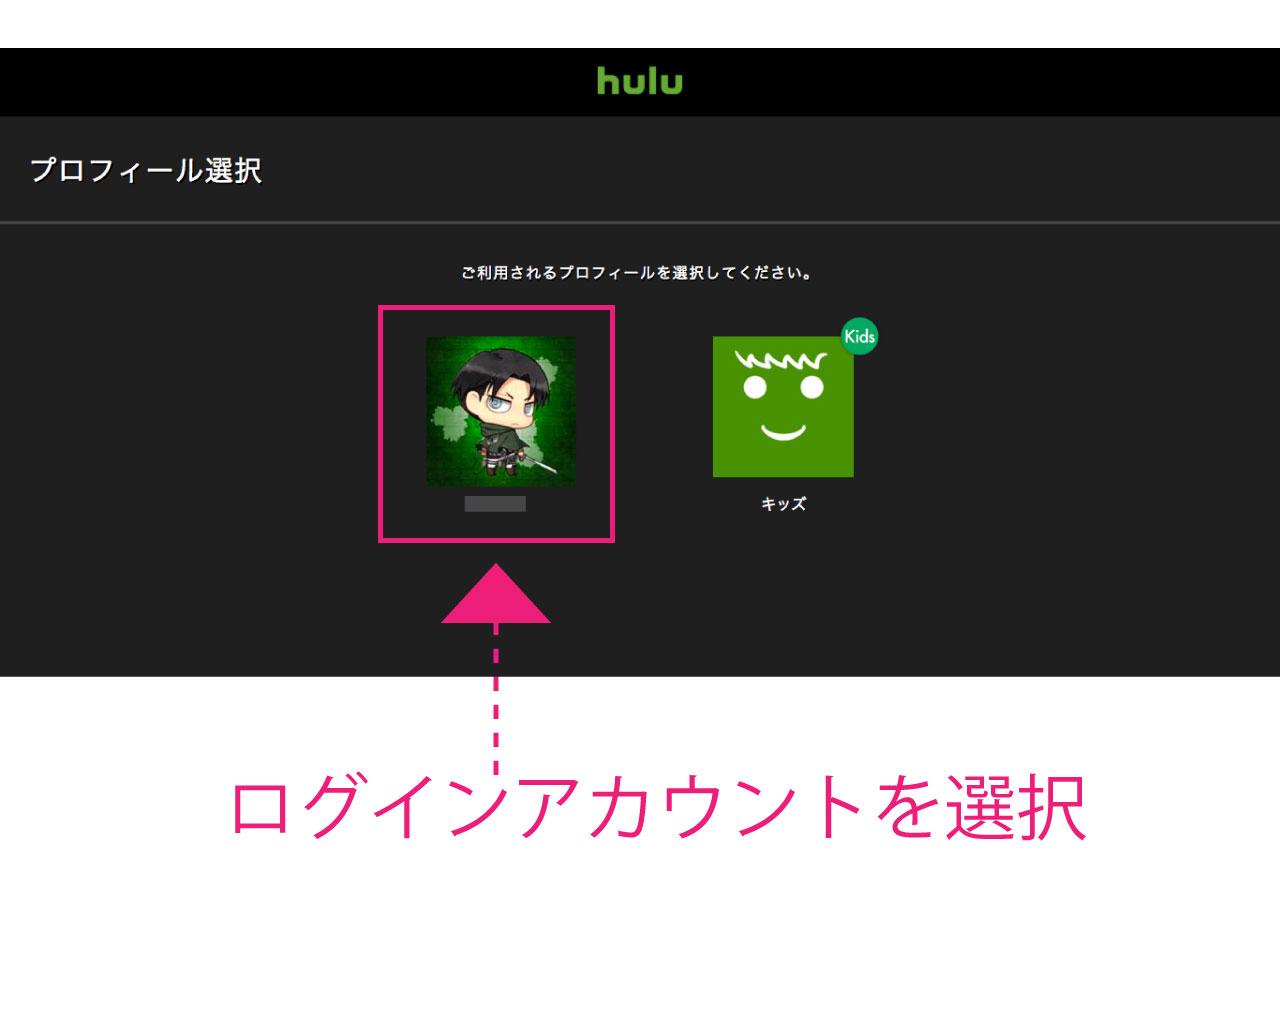 new-hulu-happyon-jp-login-0517-8